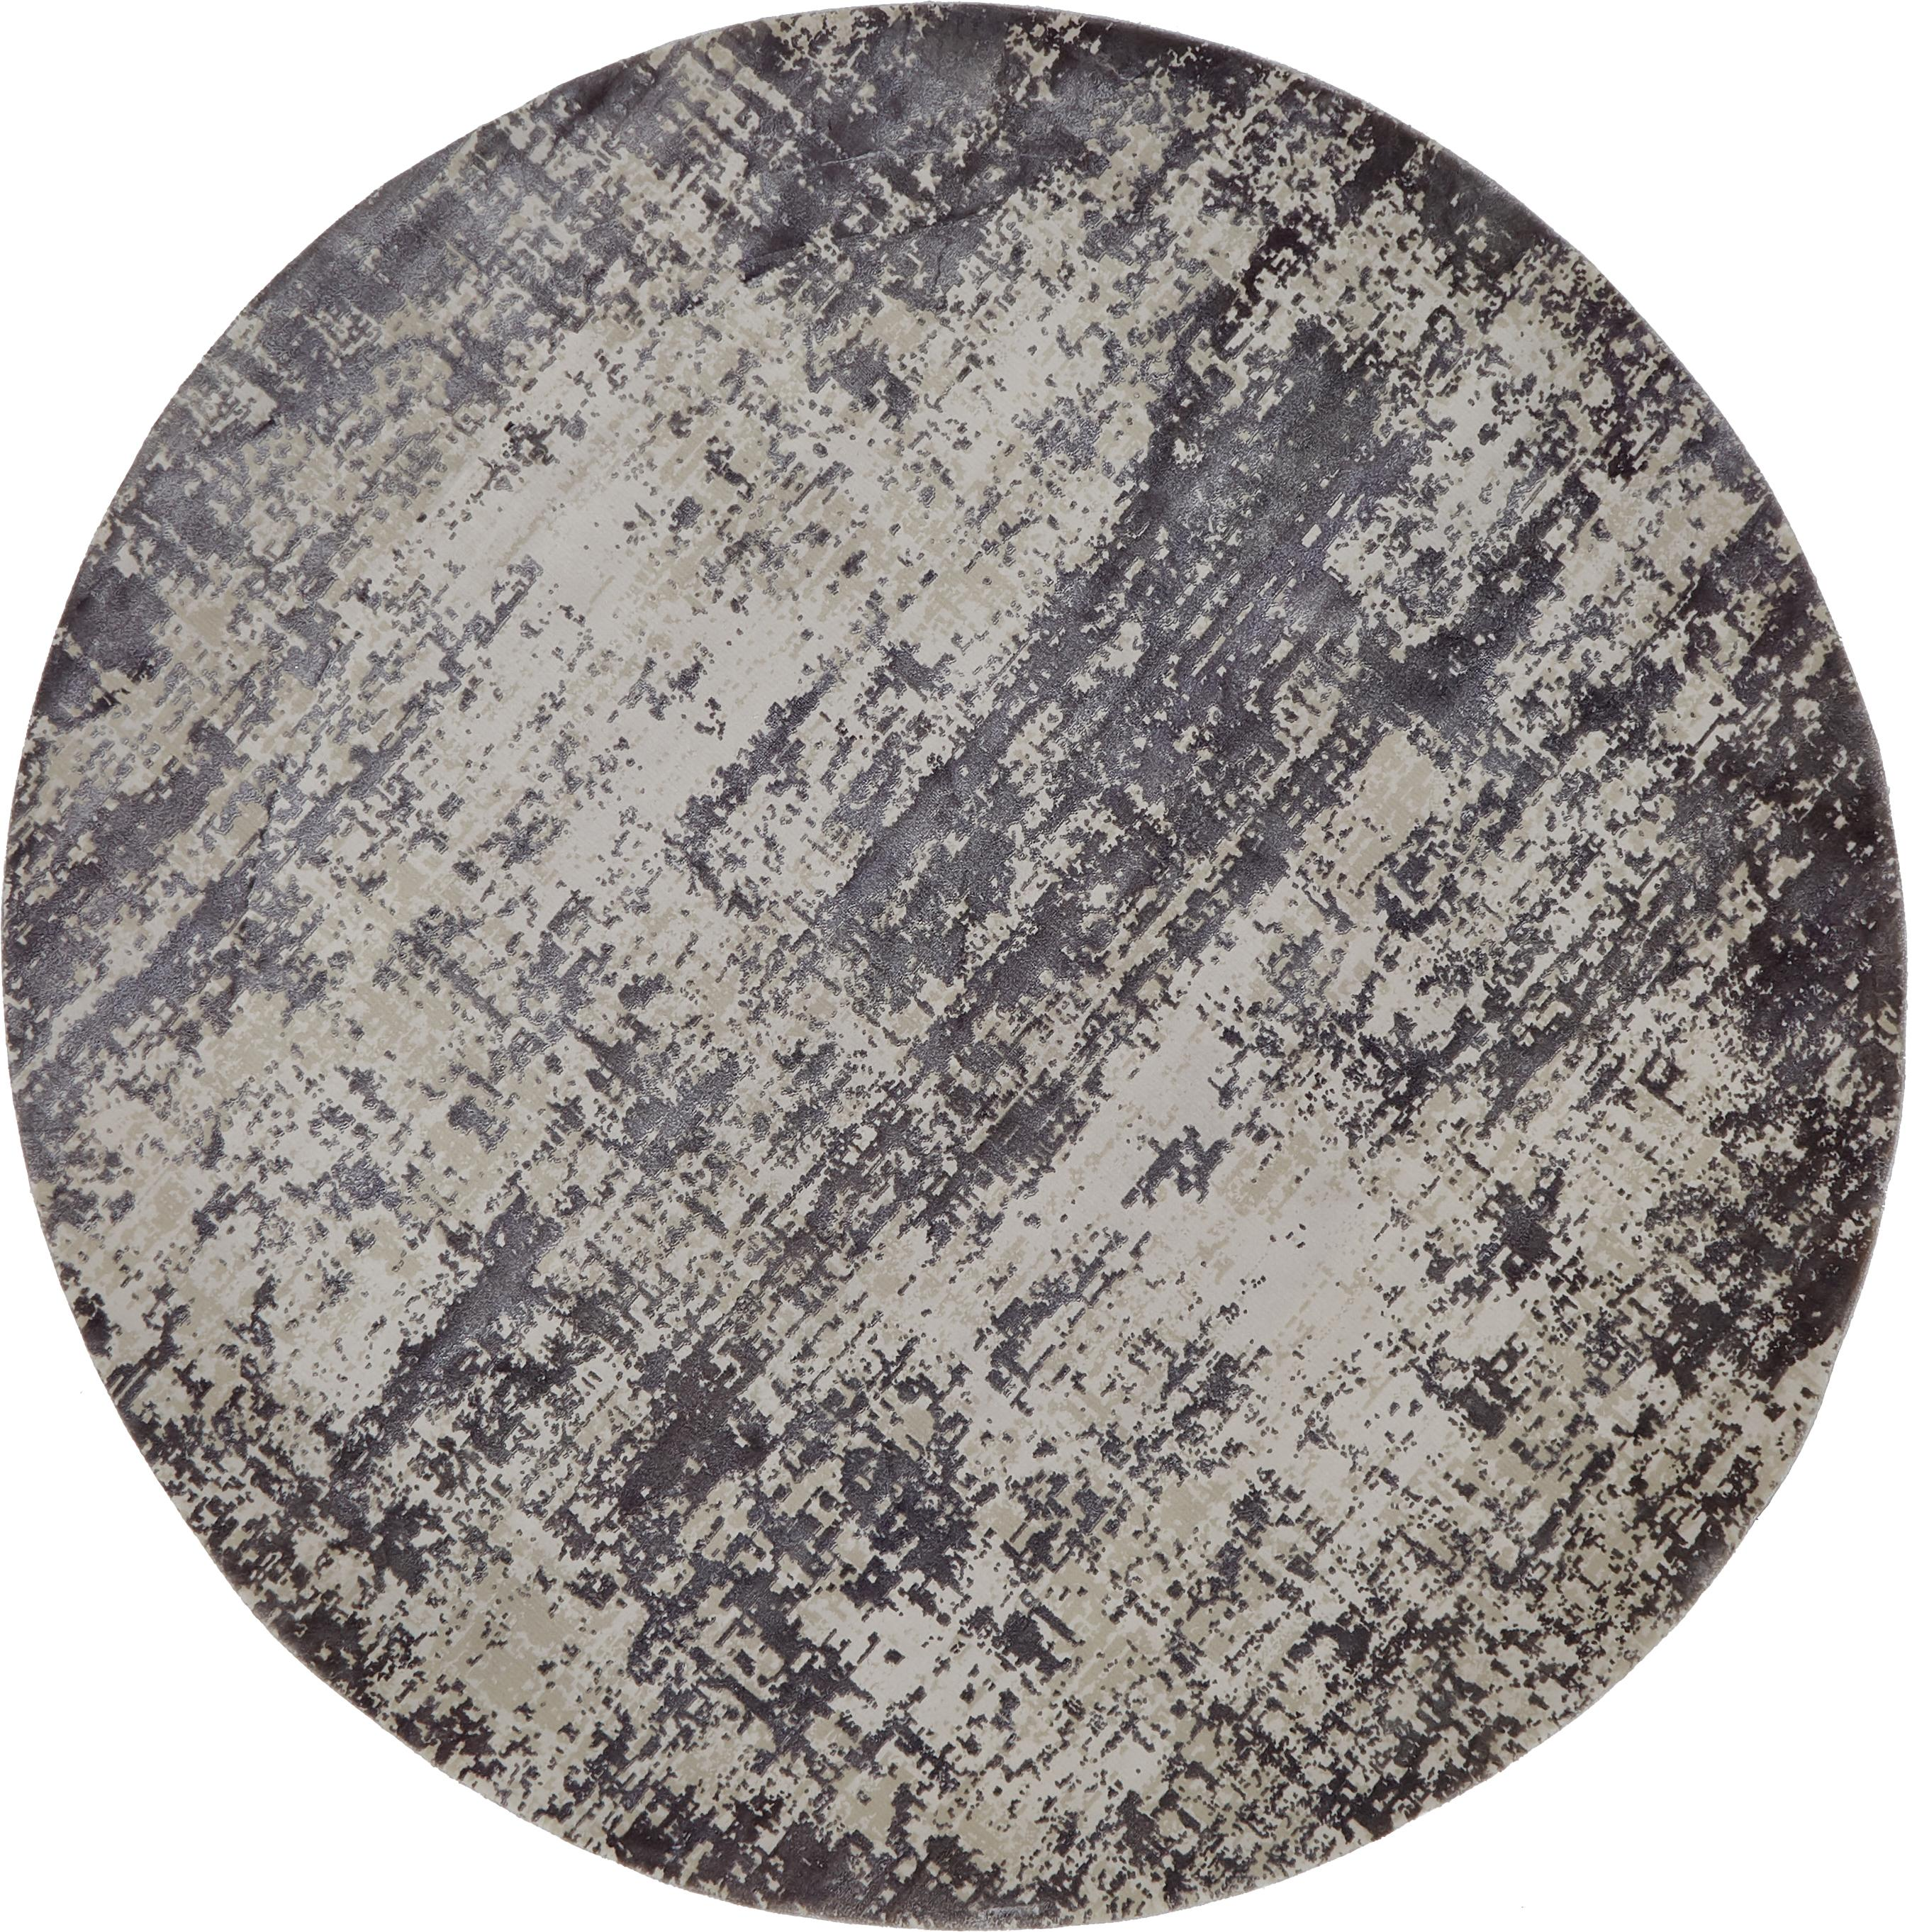 Alfombra redonda Cordoba, estilo vintage, Parte superior: 70%acrílico, 30%viscosa, Reverso: poliéster, Gris claro, gris oscuro, Ø 150 cm